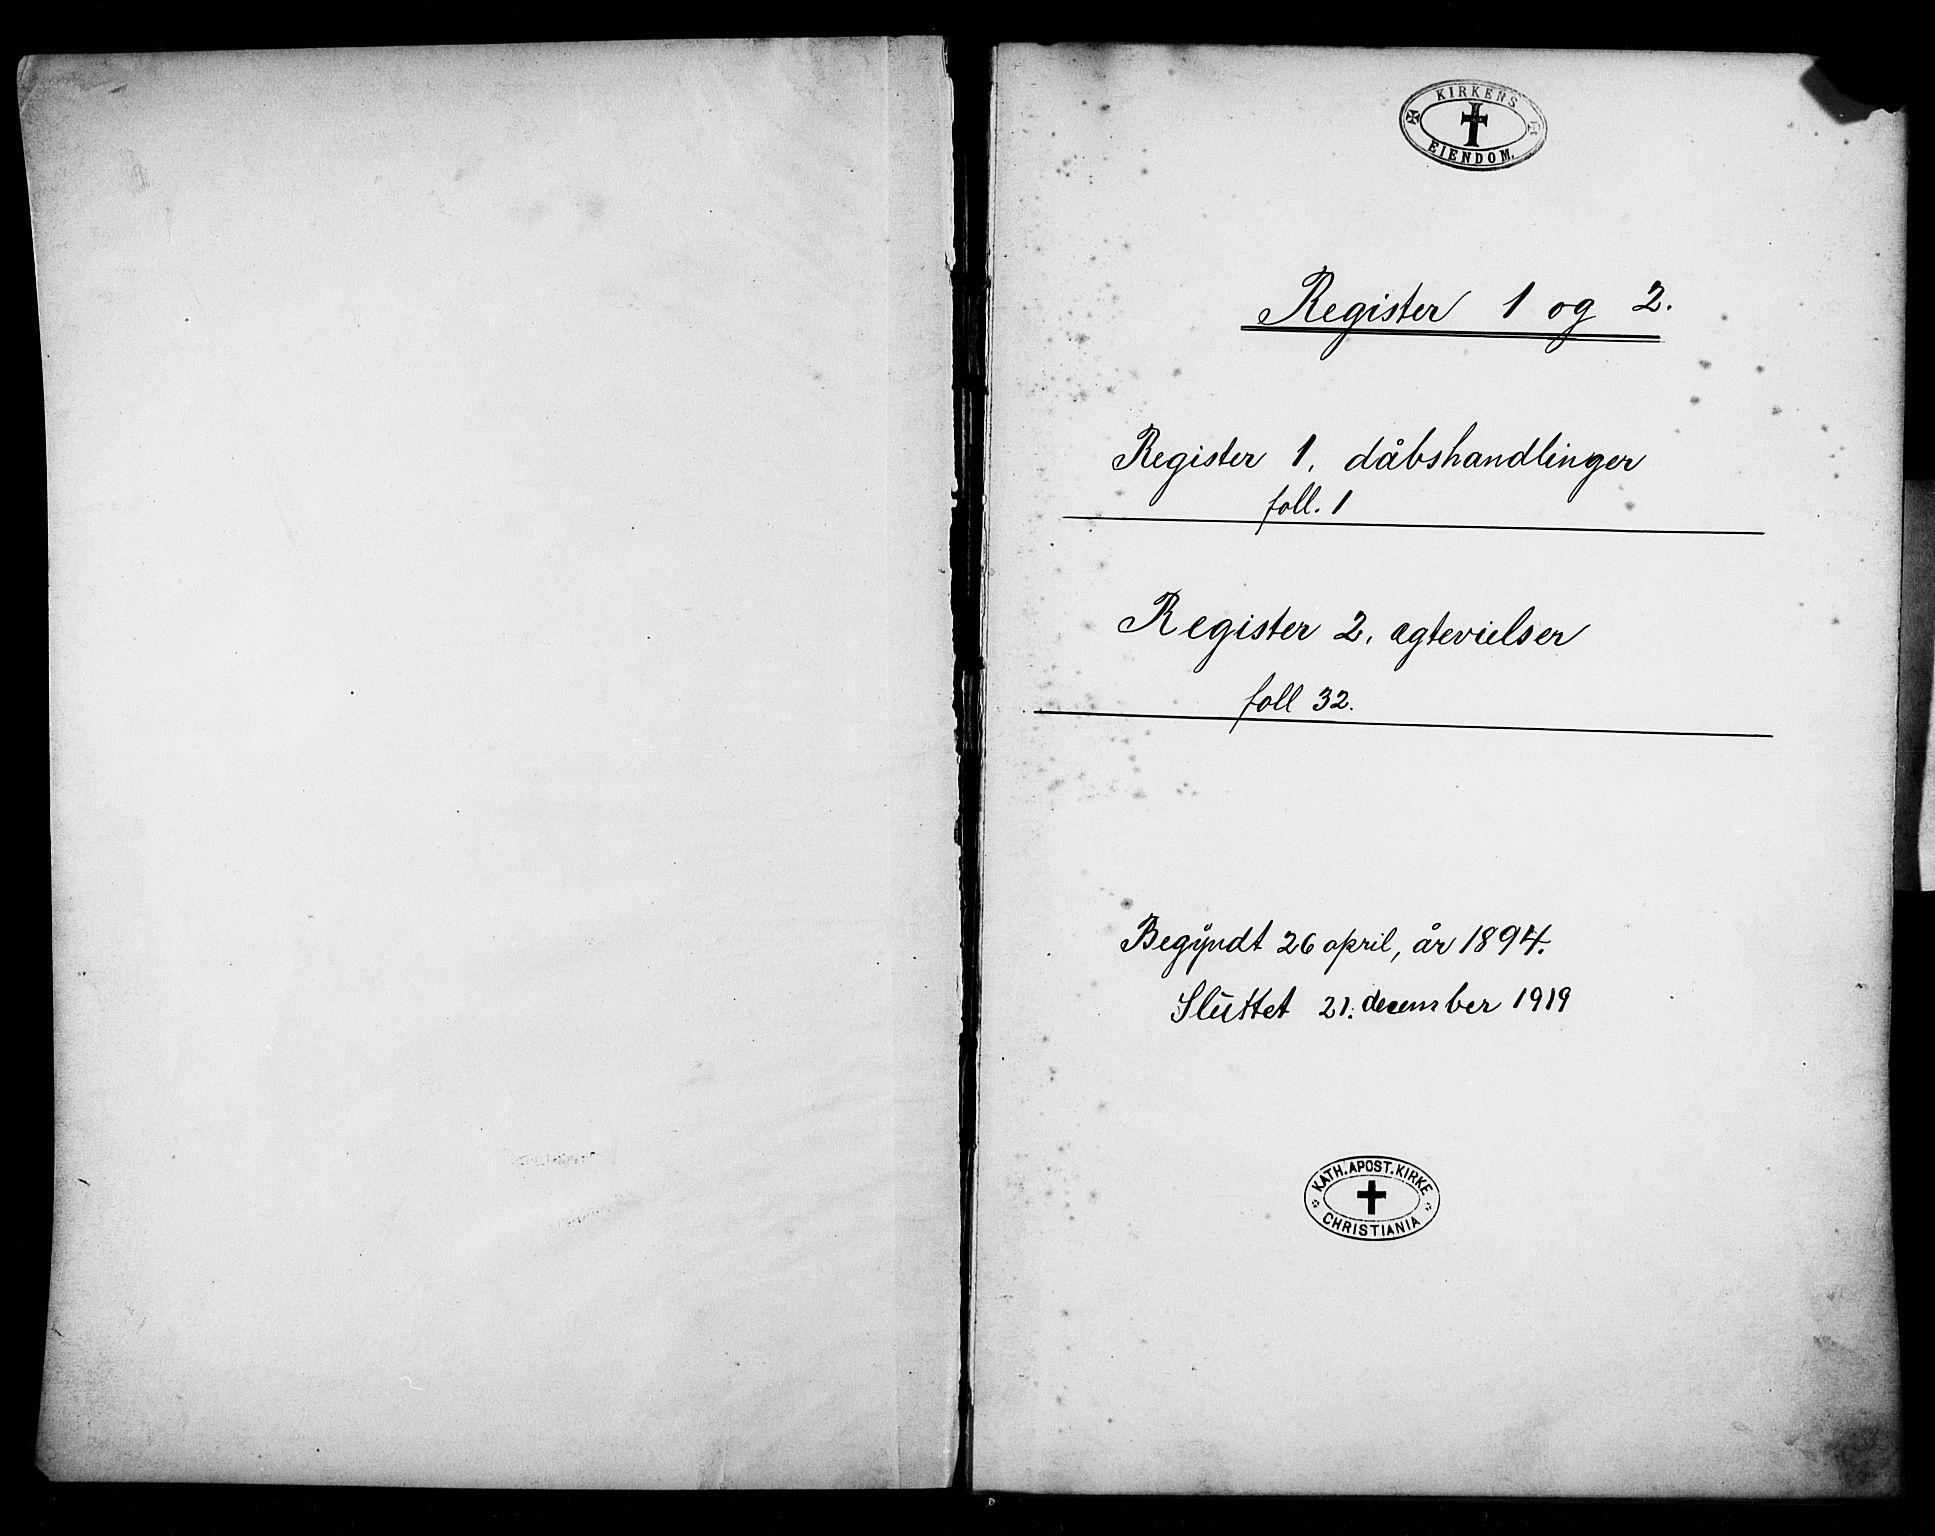 SAO, Den katolsk apostoliske menighet i Oslo , F/Fb/L0002: Dissenterprotokoll nr. 2, 1894-1919